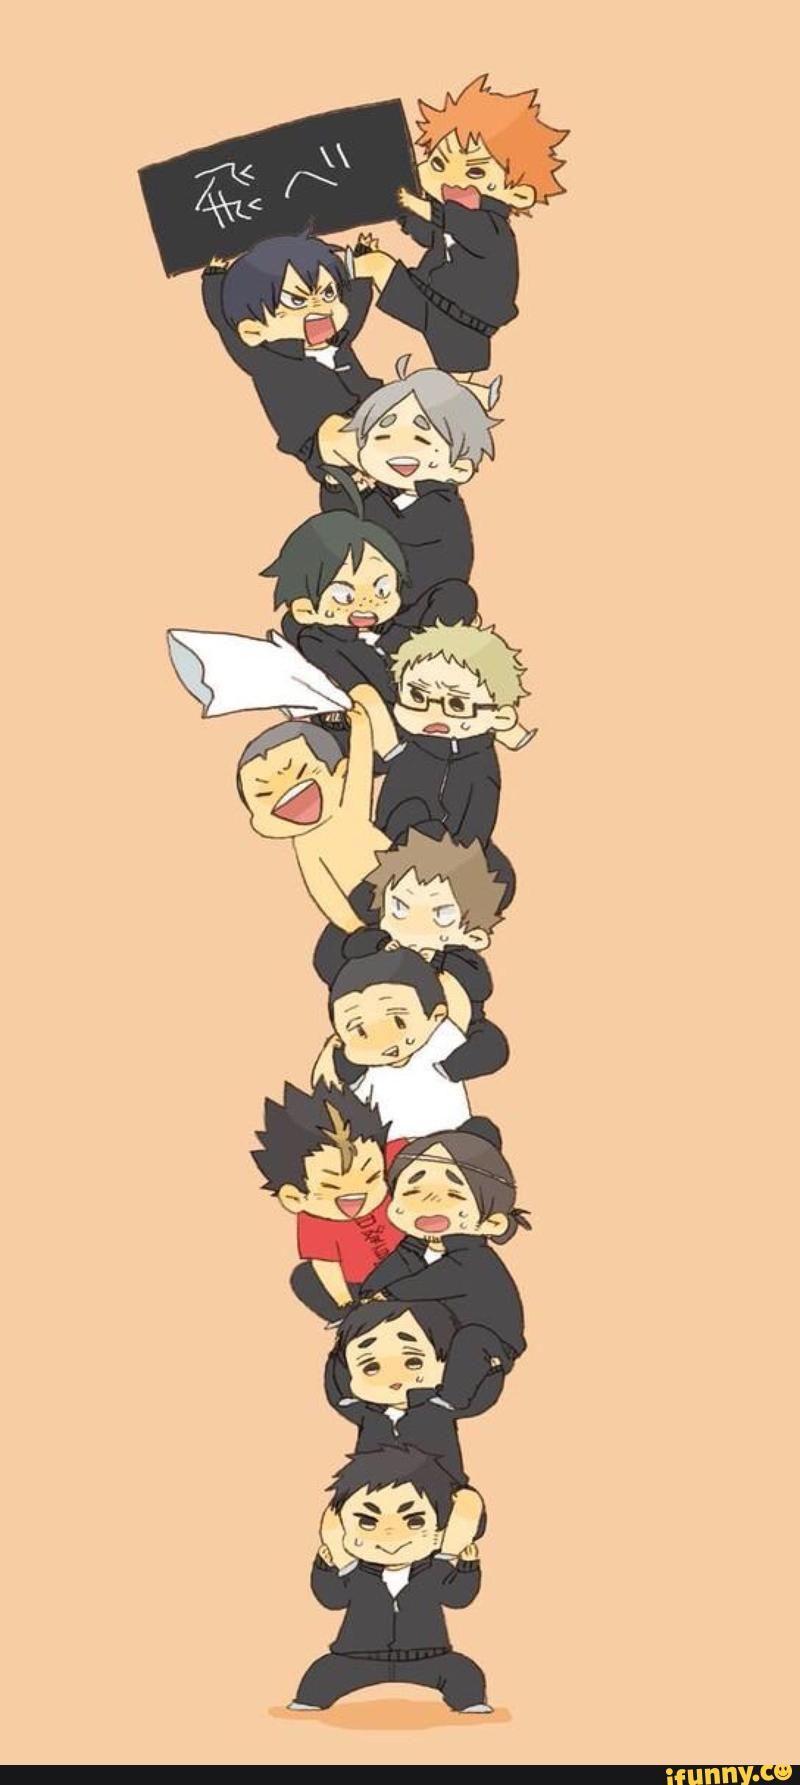 Haikyuu Karasuno Haikyuu Wallpaper Cute Anime Wallpaper Haikyuu Anime